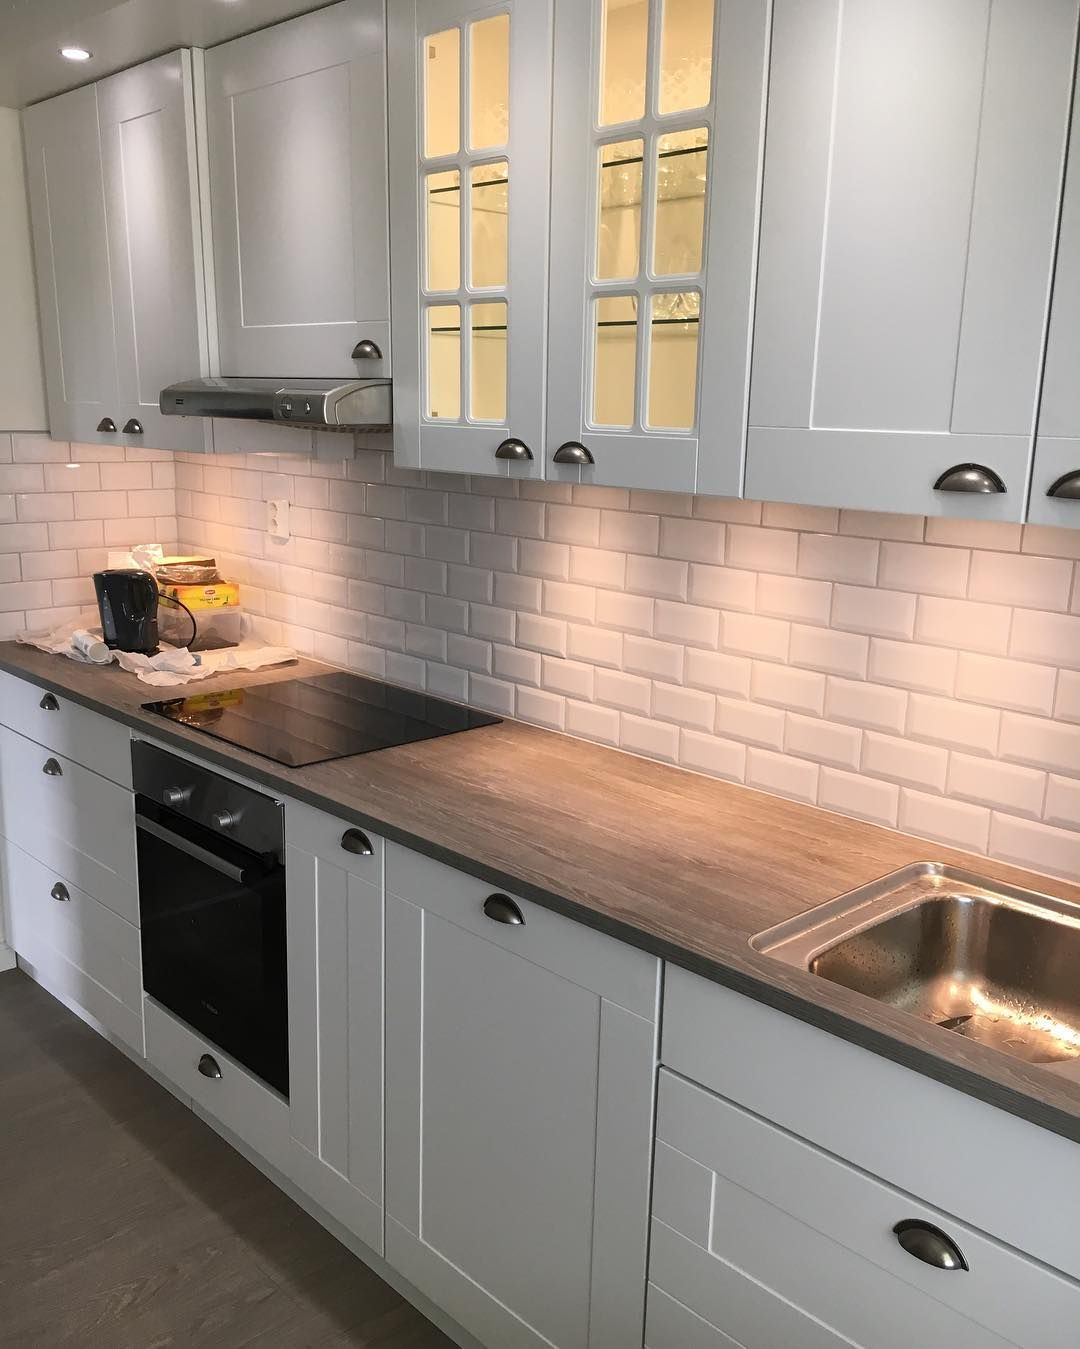 Kok Snickare Designe Kvik Ikea Marbodal Eboq Small Kitchen Decor Kitchen Design Small Kitchen Design